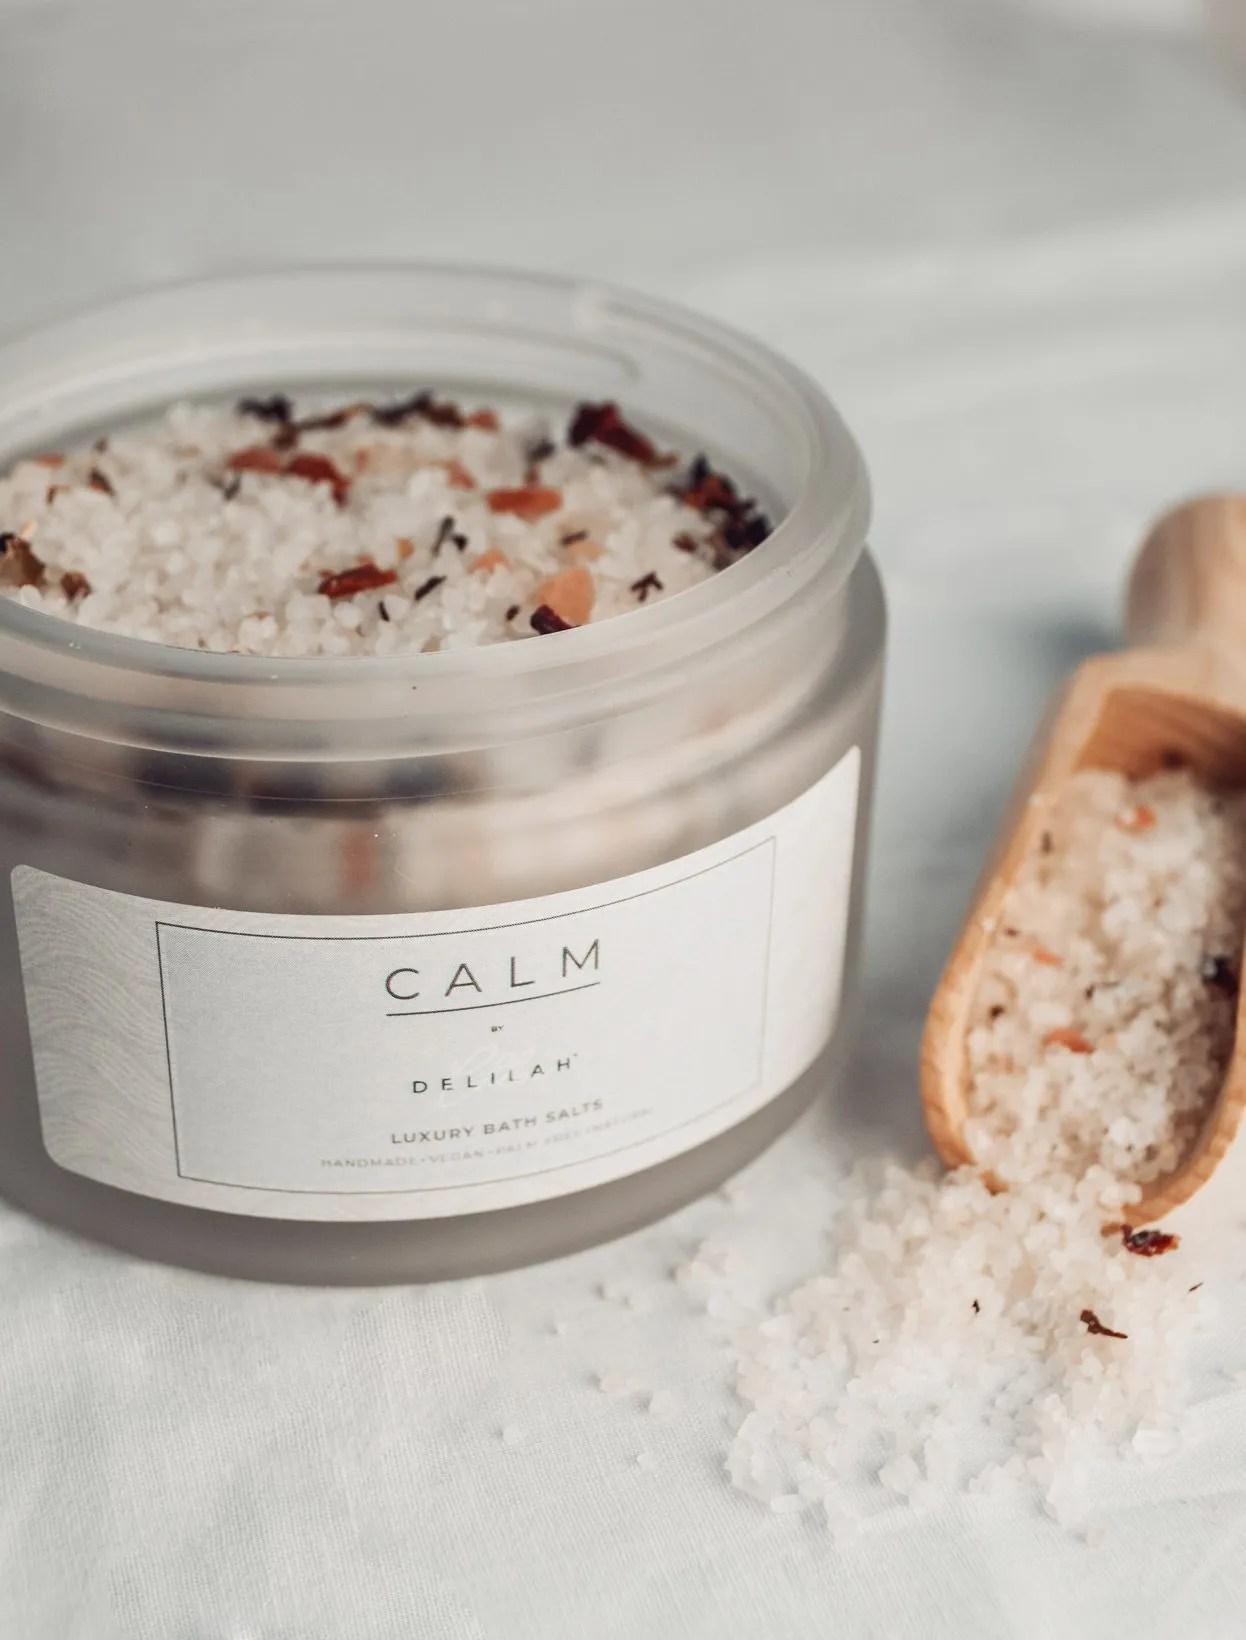 All-Natural Luxury Dead Sea, Himalayan Pink and Epsom Salts, CALM by Delilah Chloe. Handmade, vegan friendly bath salt range